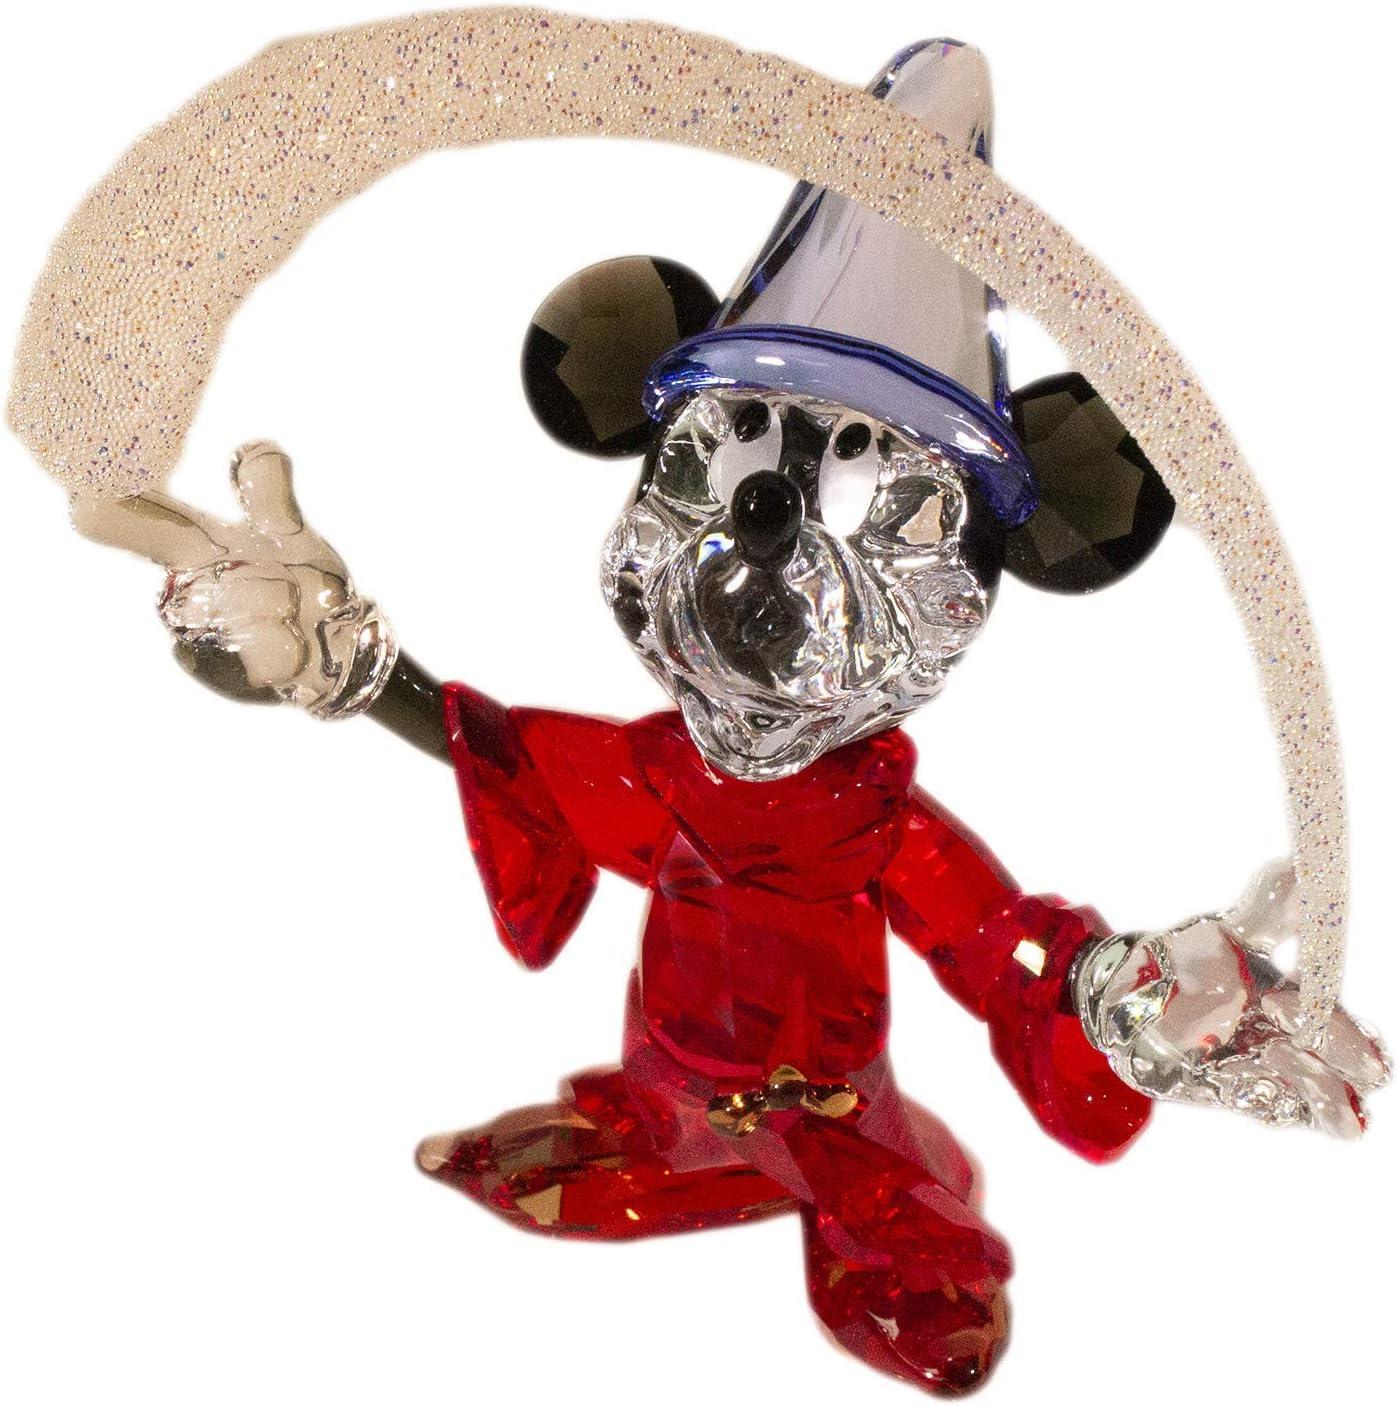 Swarovski Disney - Sorcerer Mickey Mouse Limited Edition - 5004740